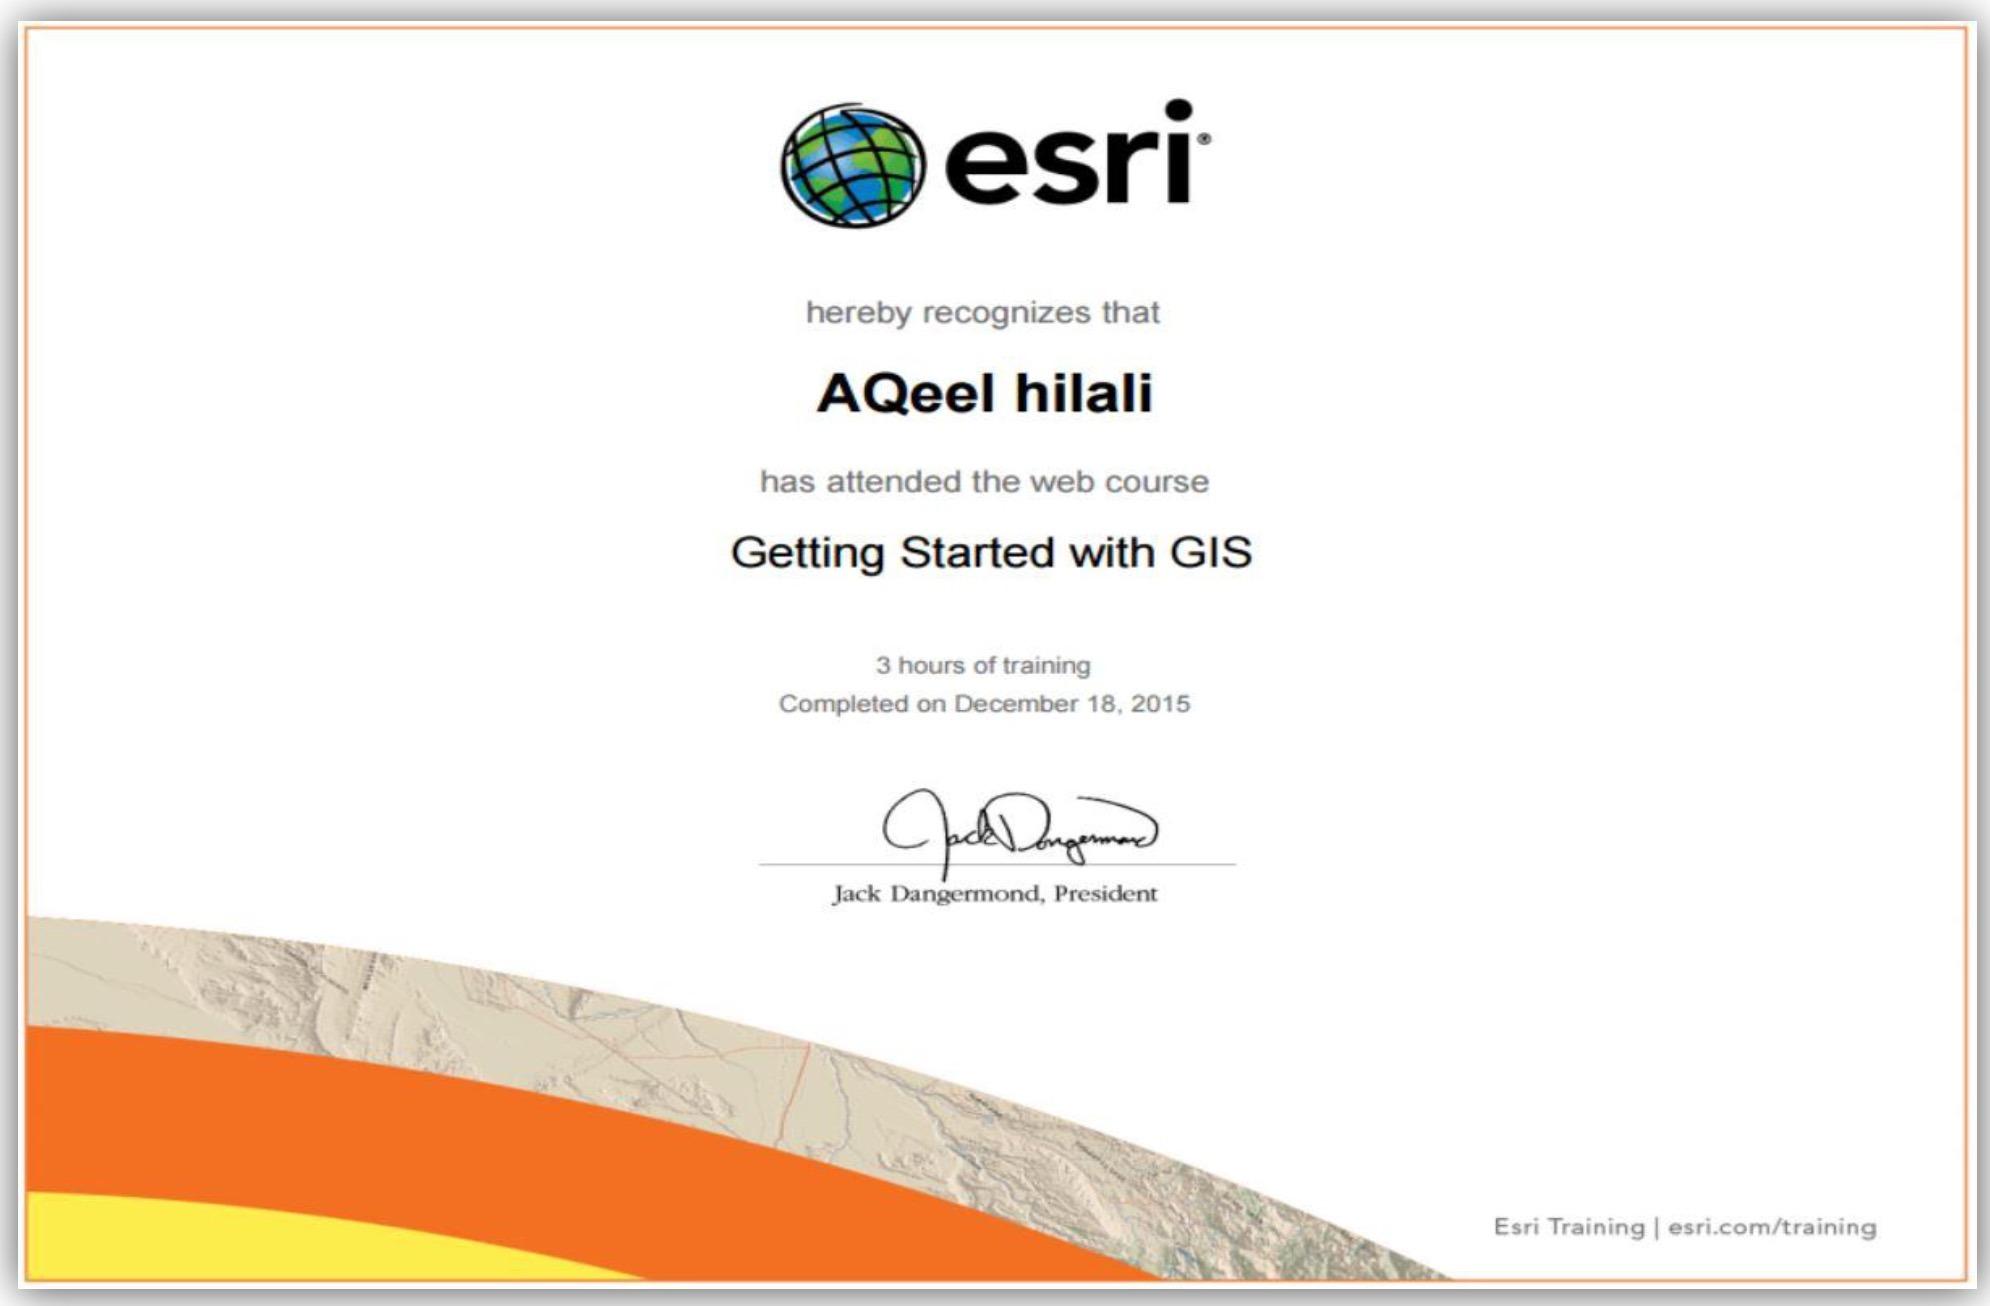 Aqeel nahi saeed bayt esrigetting started with gis certificate xflitez Gallery